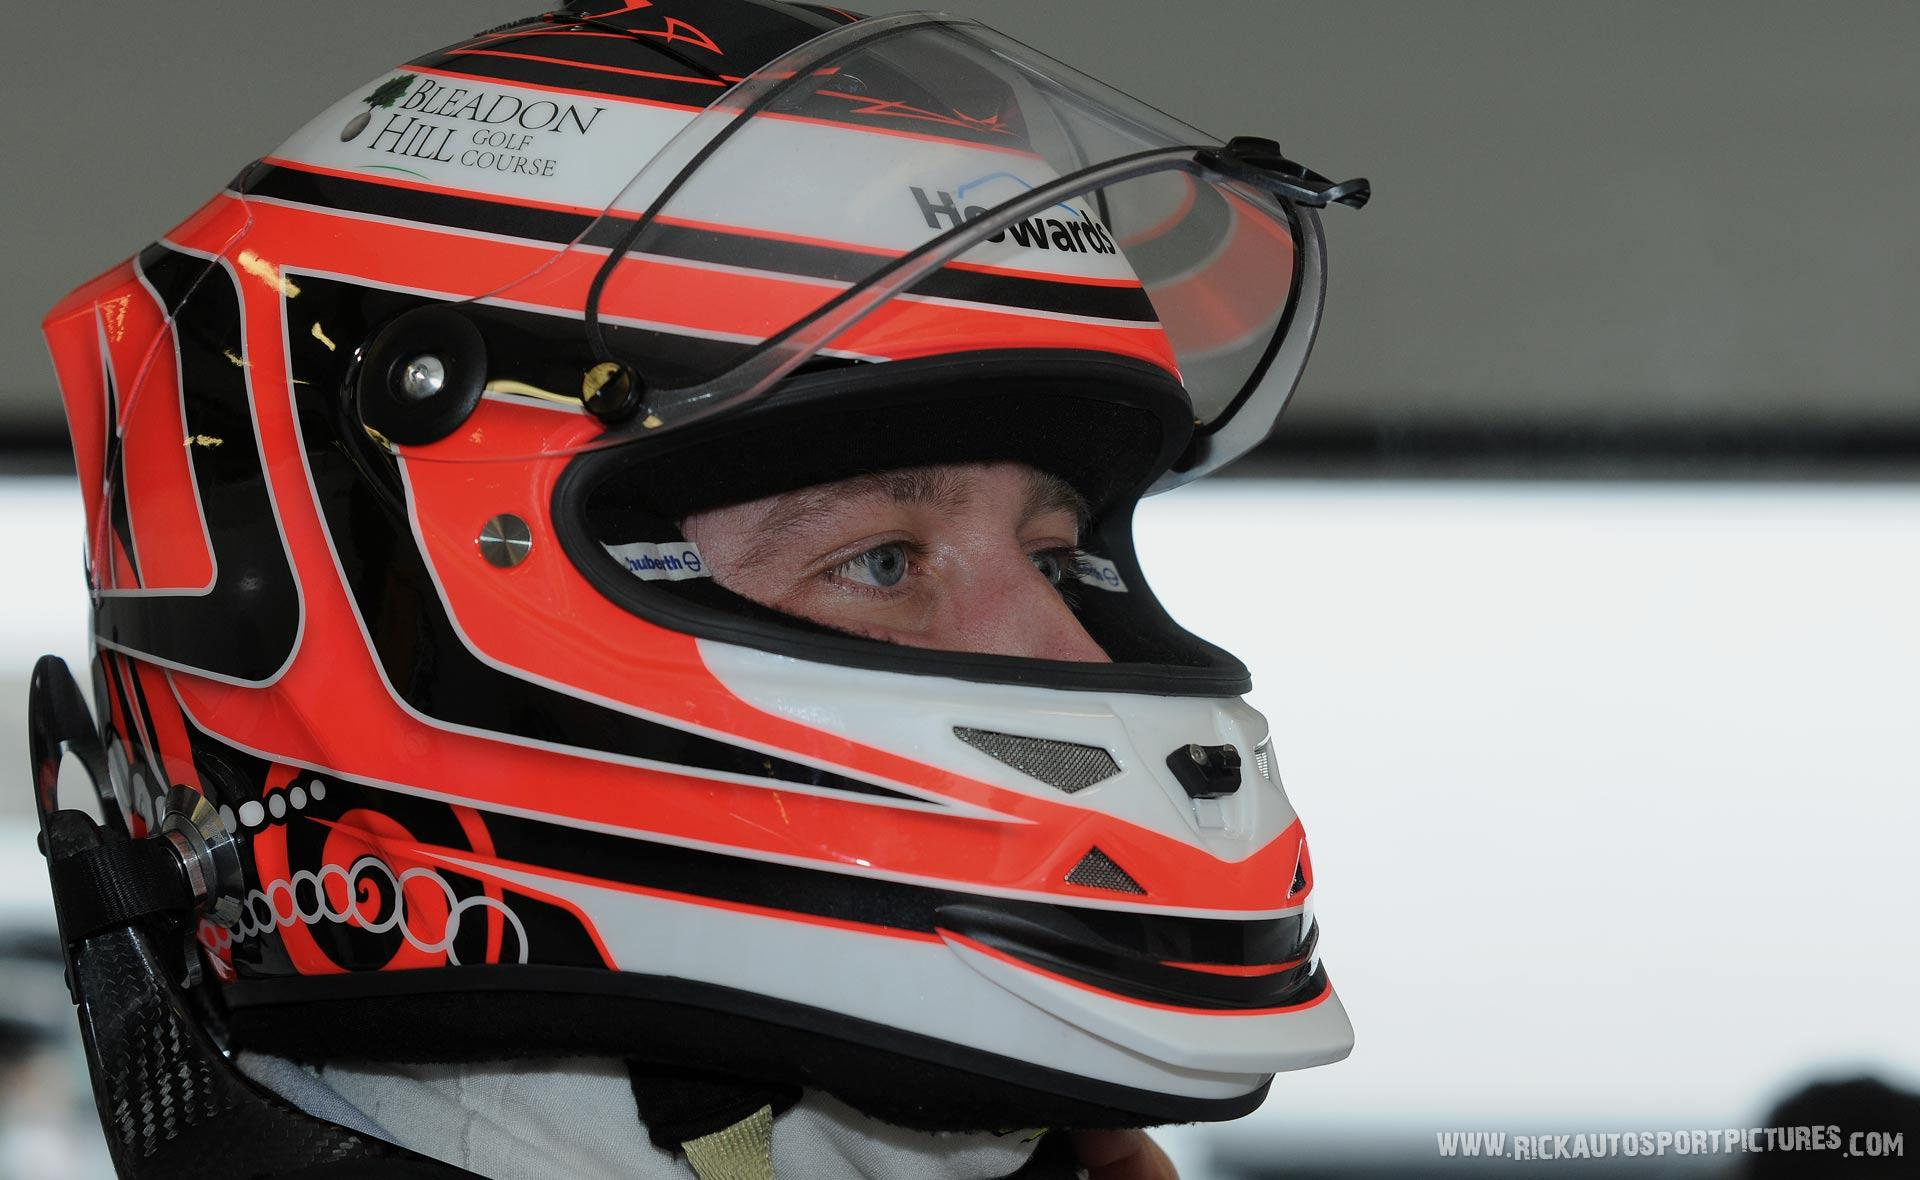 Jonathan Coleman Silverstone 2016